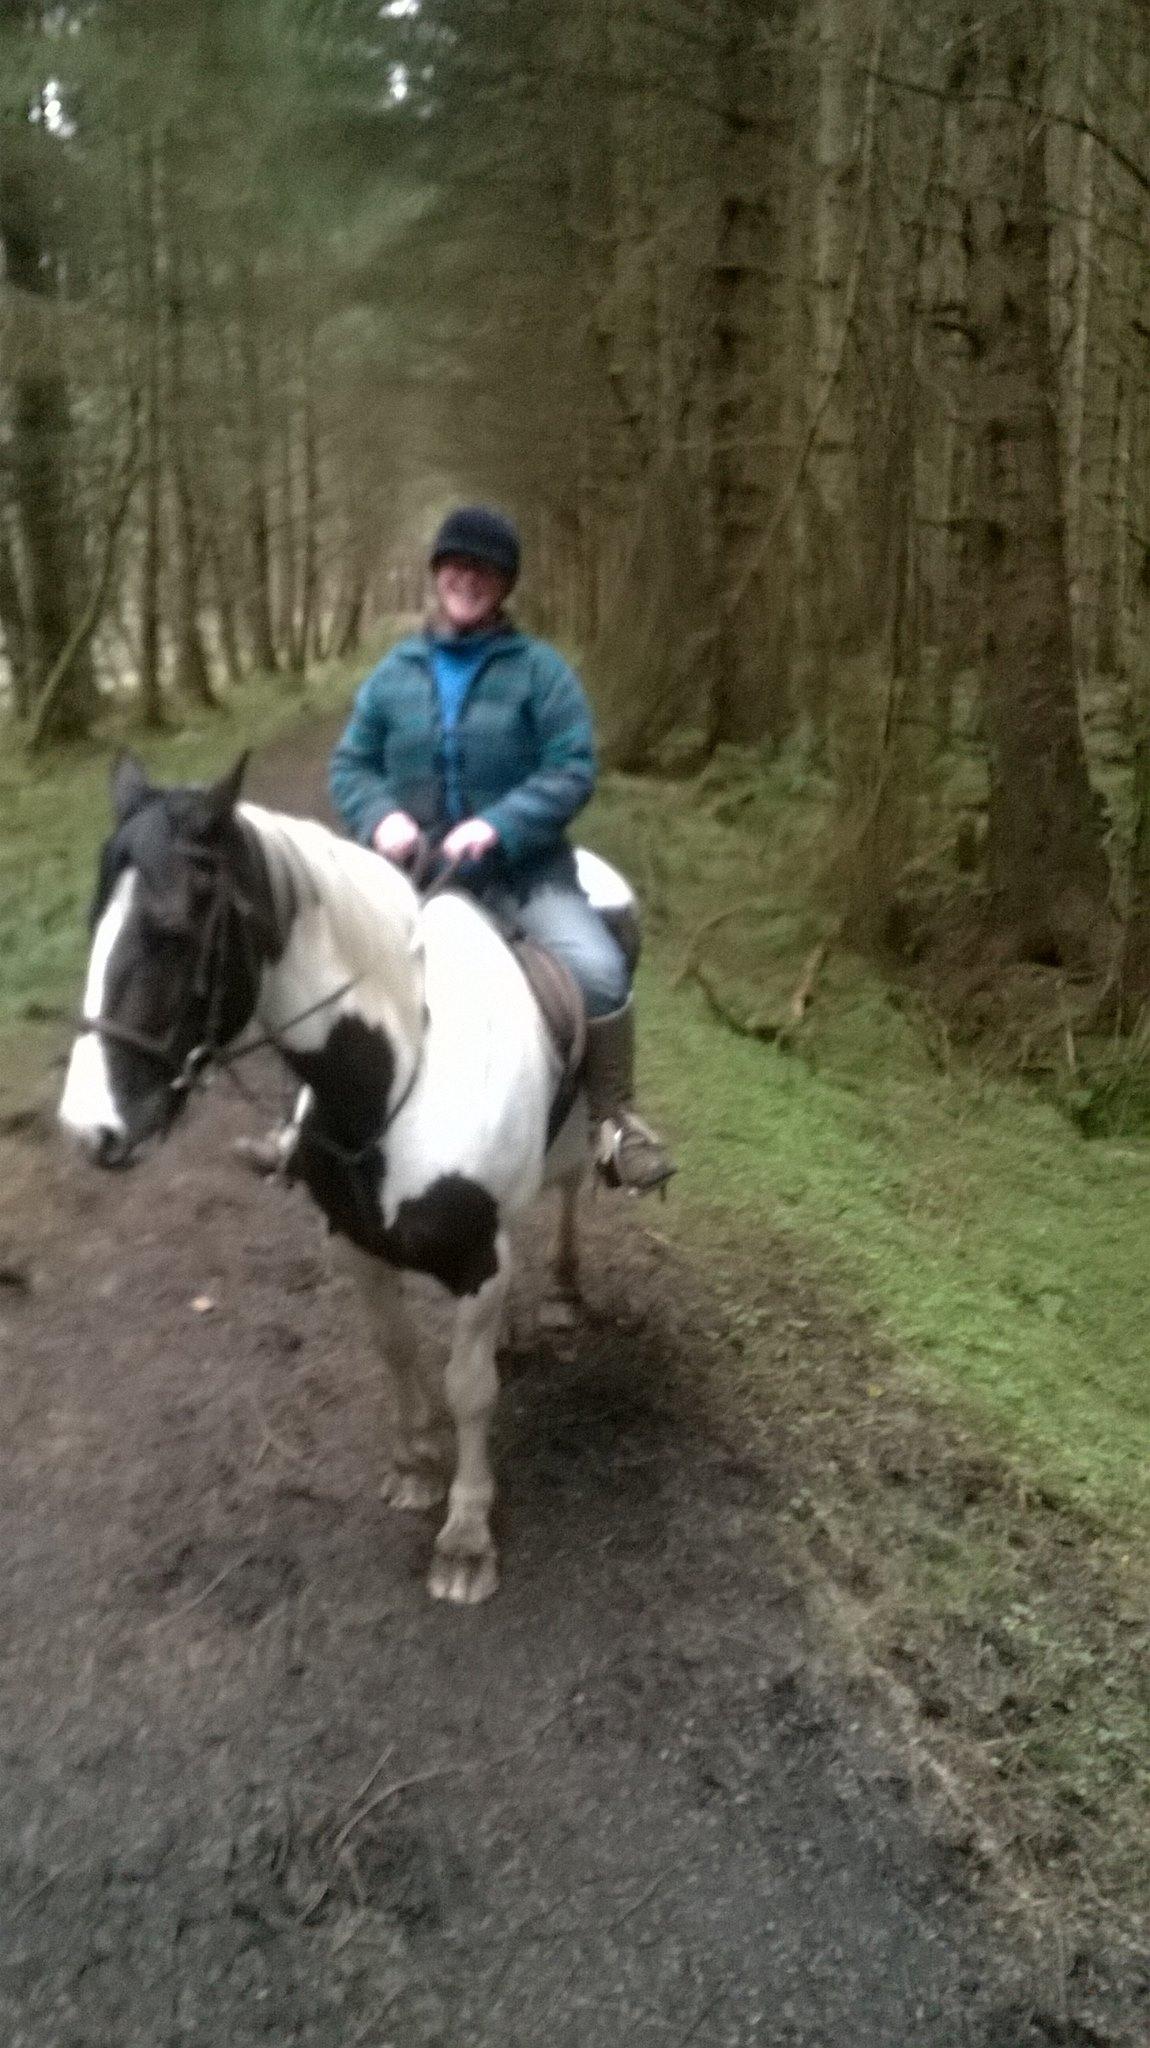 Riding through The Bonny Glen, Donegal